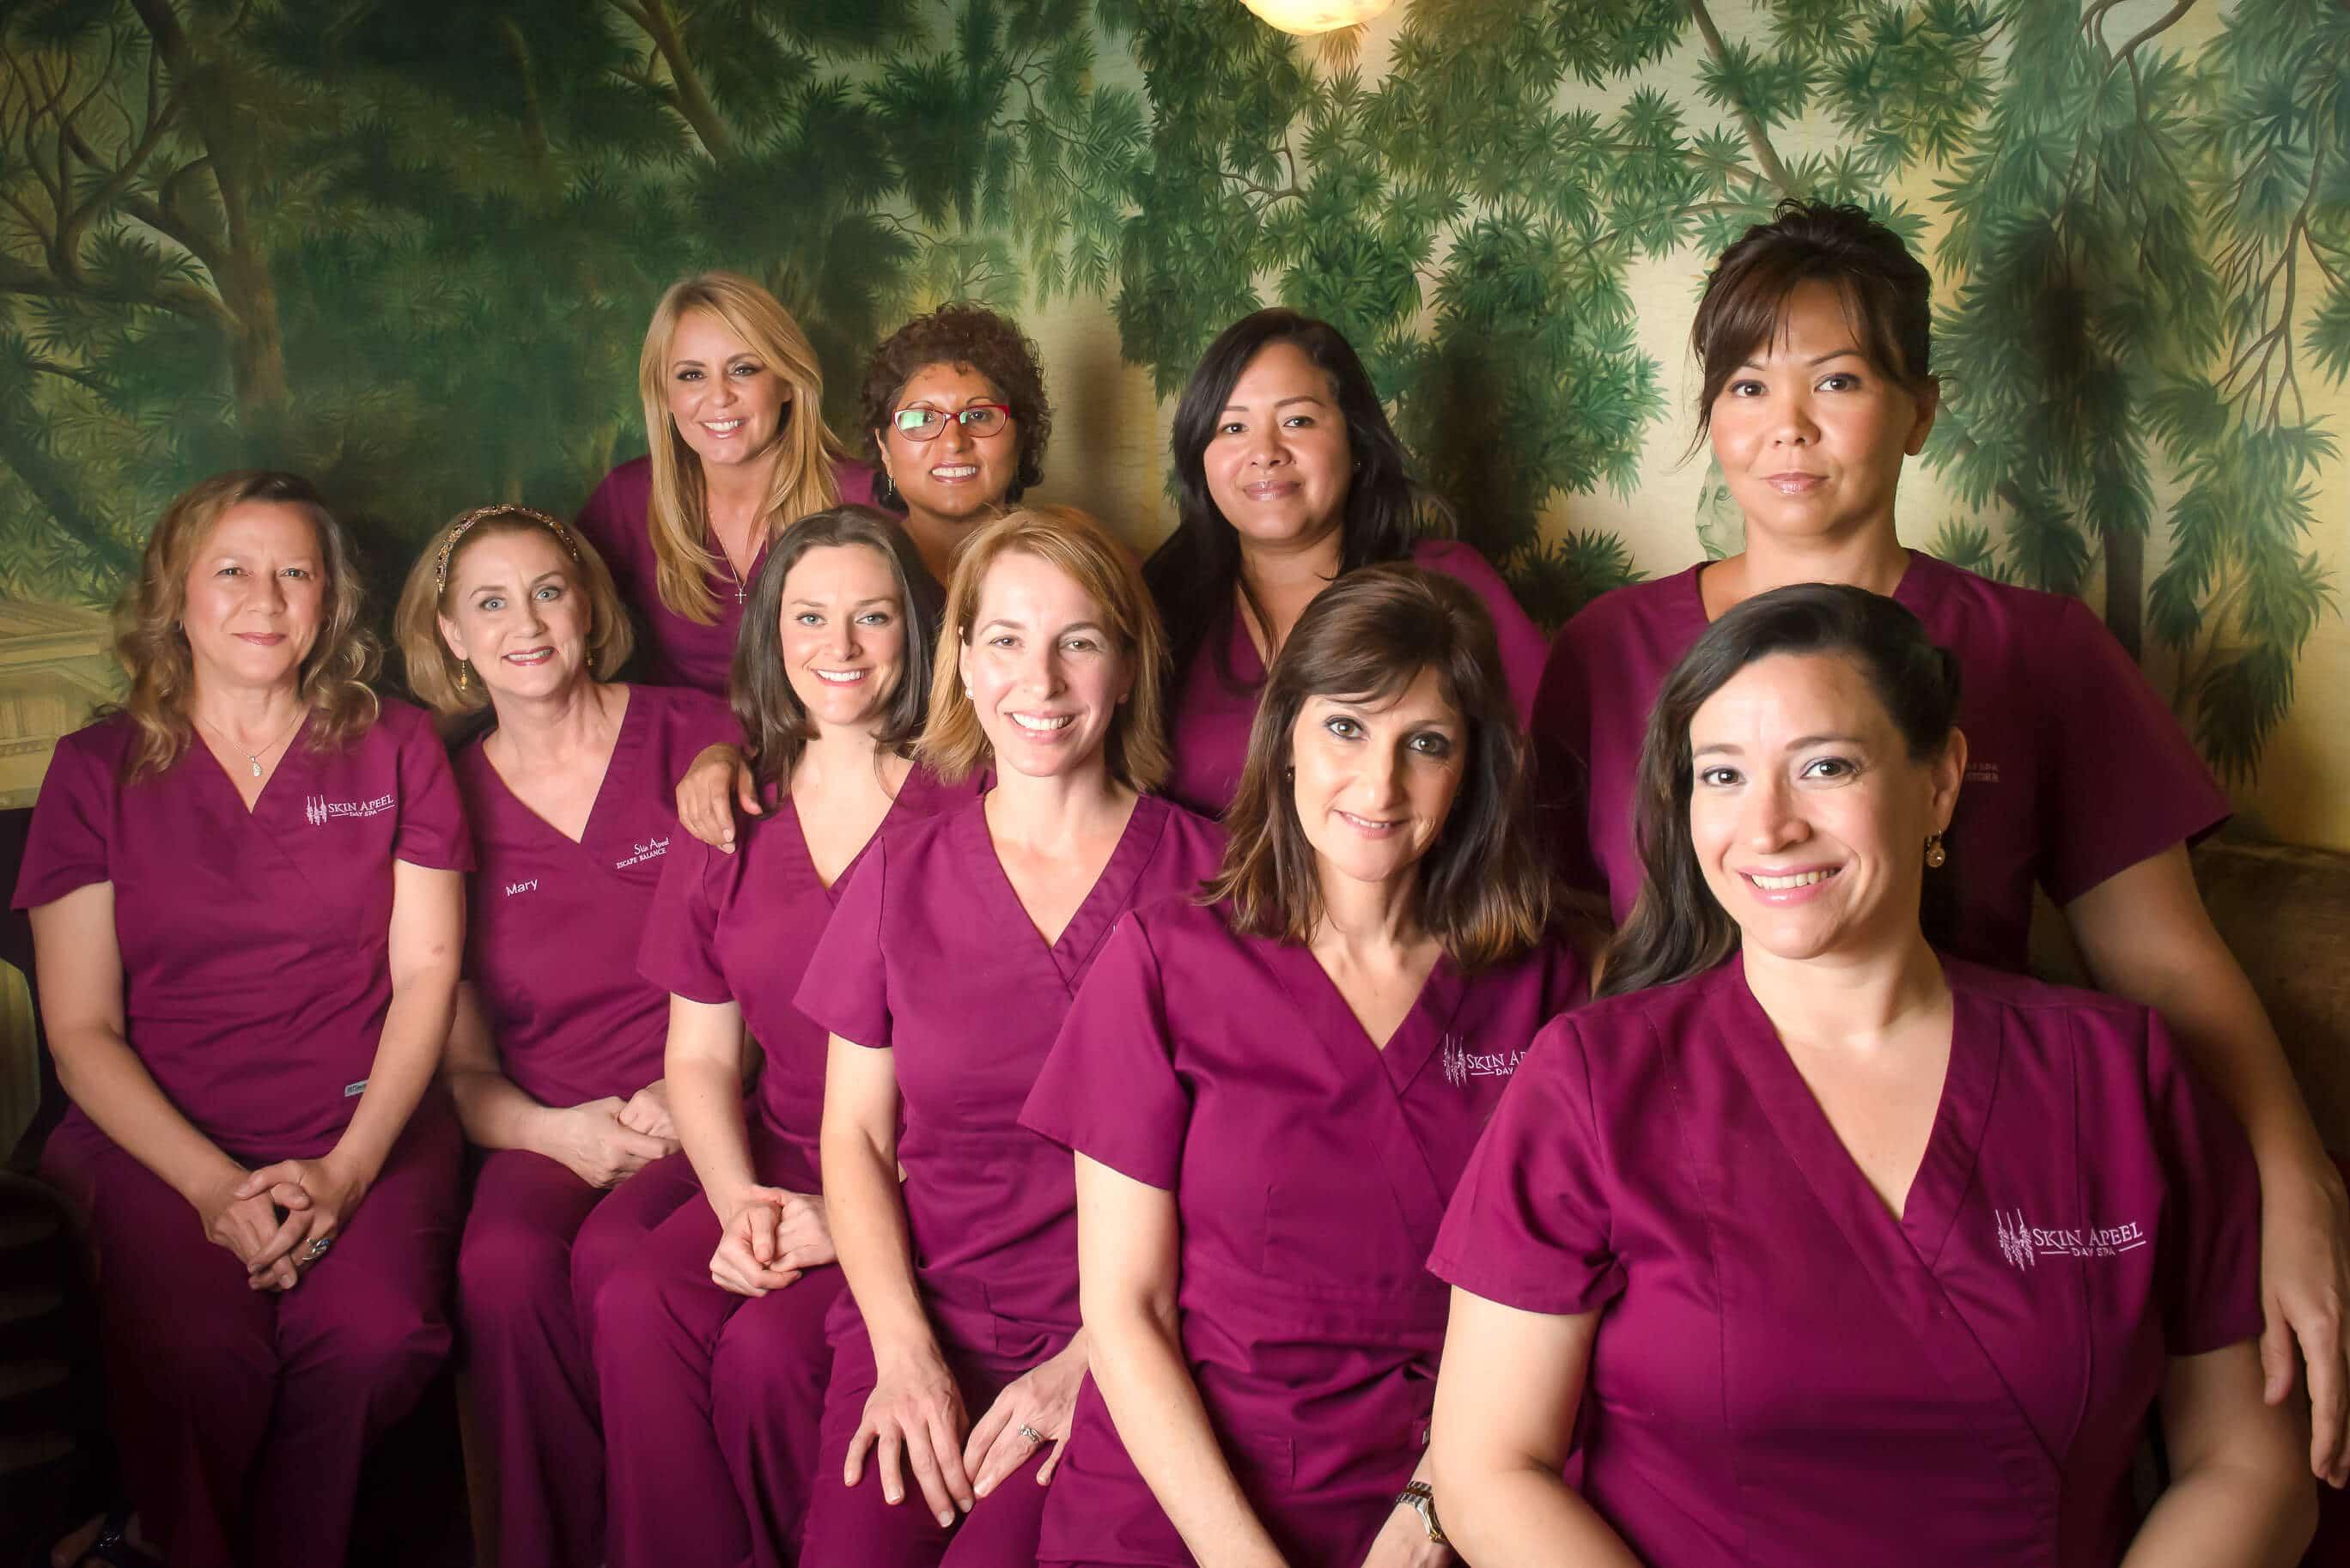 Skin Apeel Skin Care Specialists